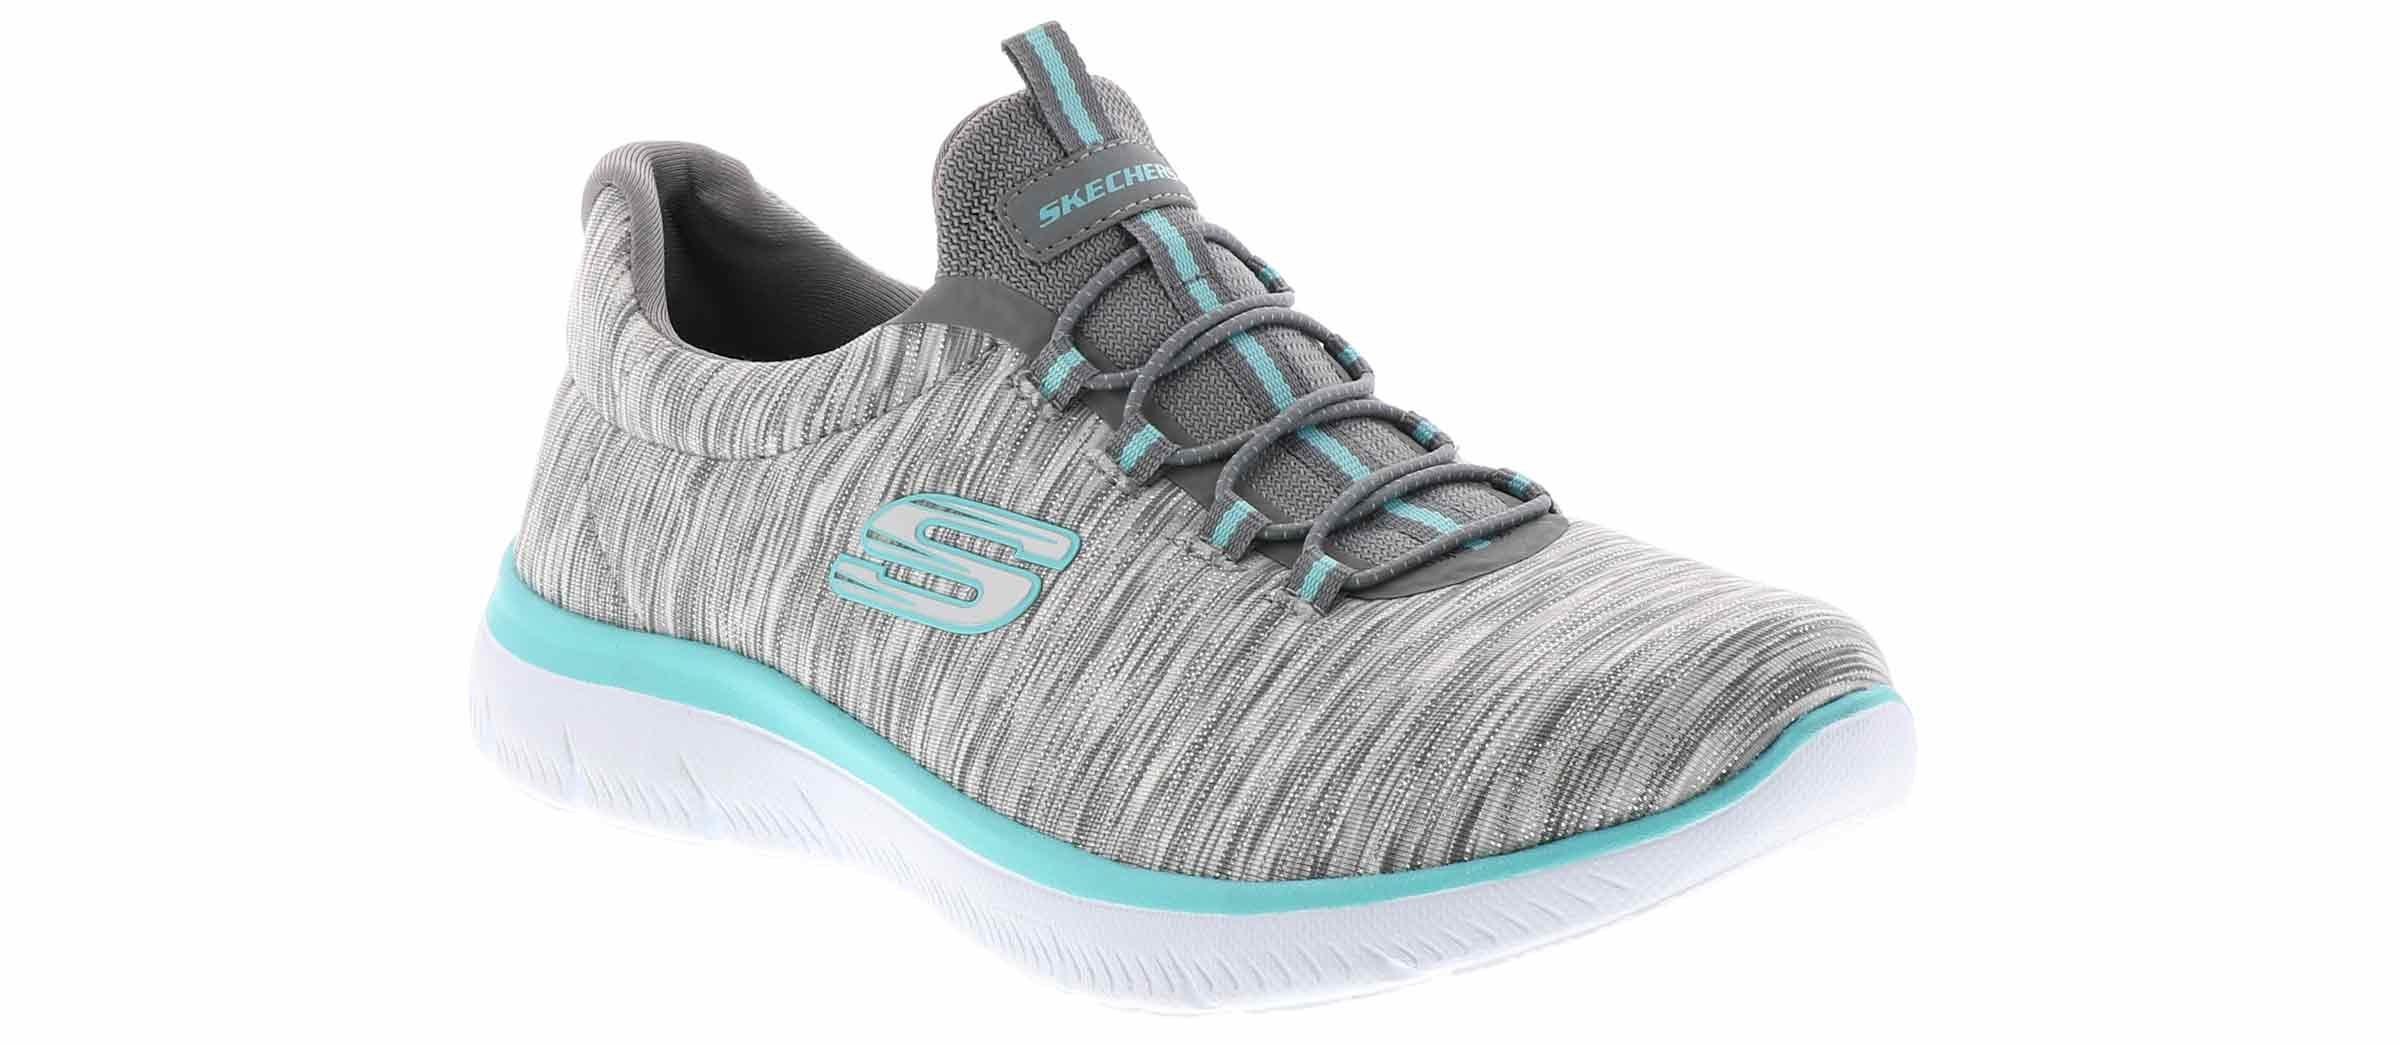 Skechers Women's Light Dreaming Sneaker Style 12984 GYLB